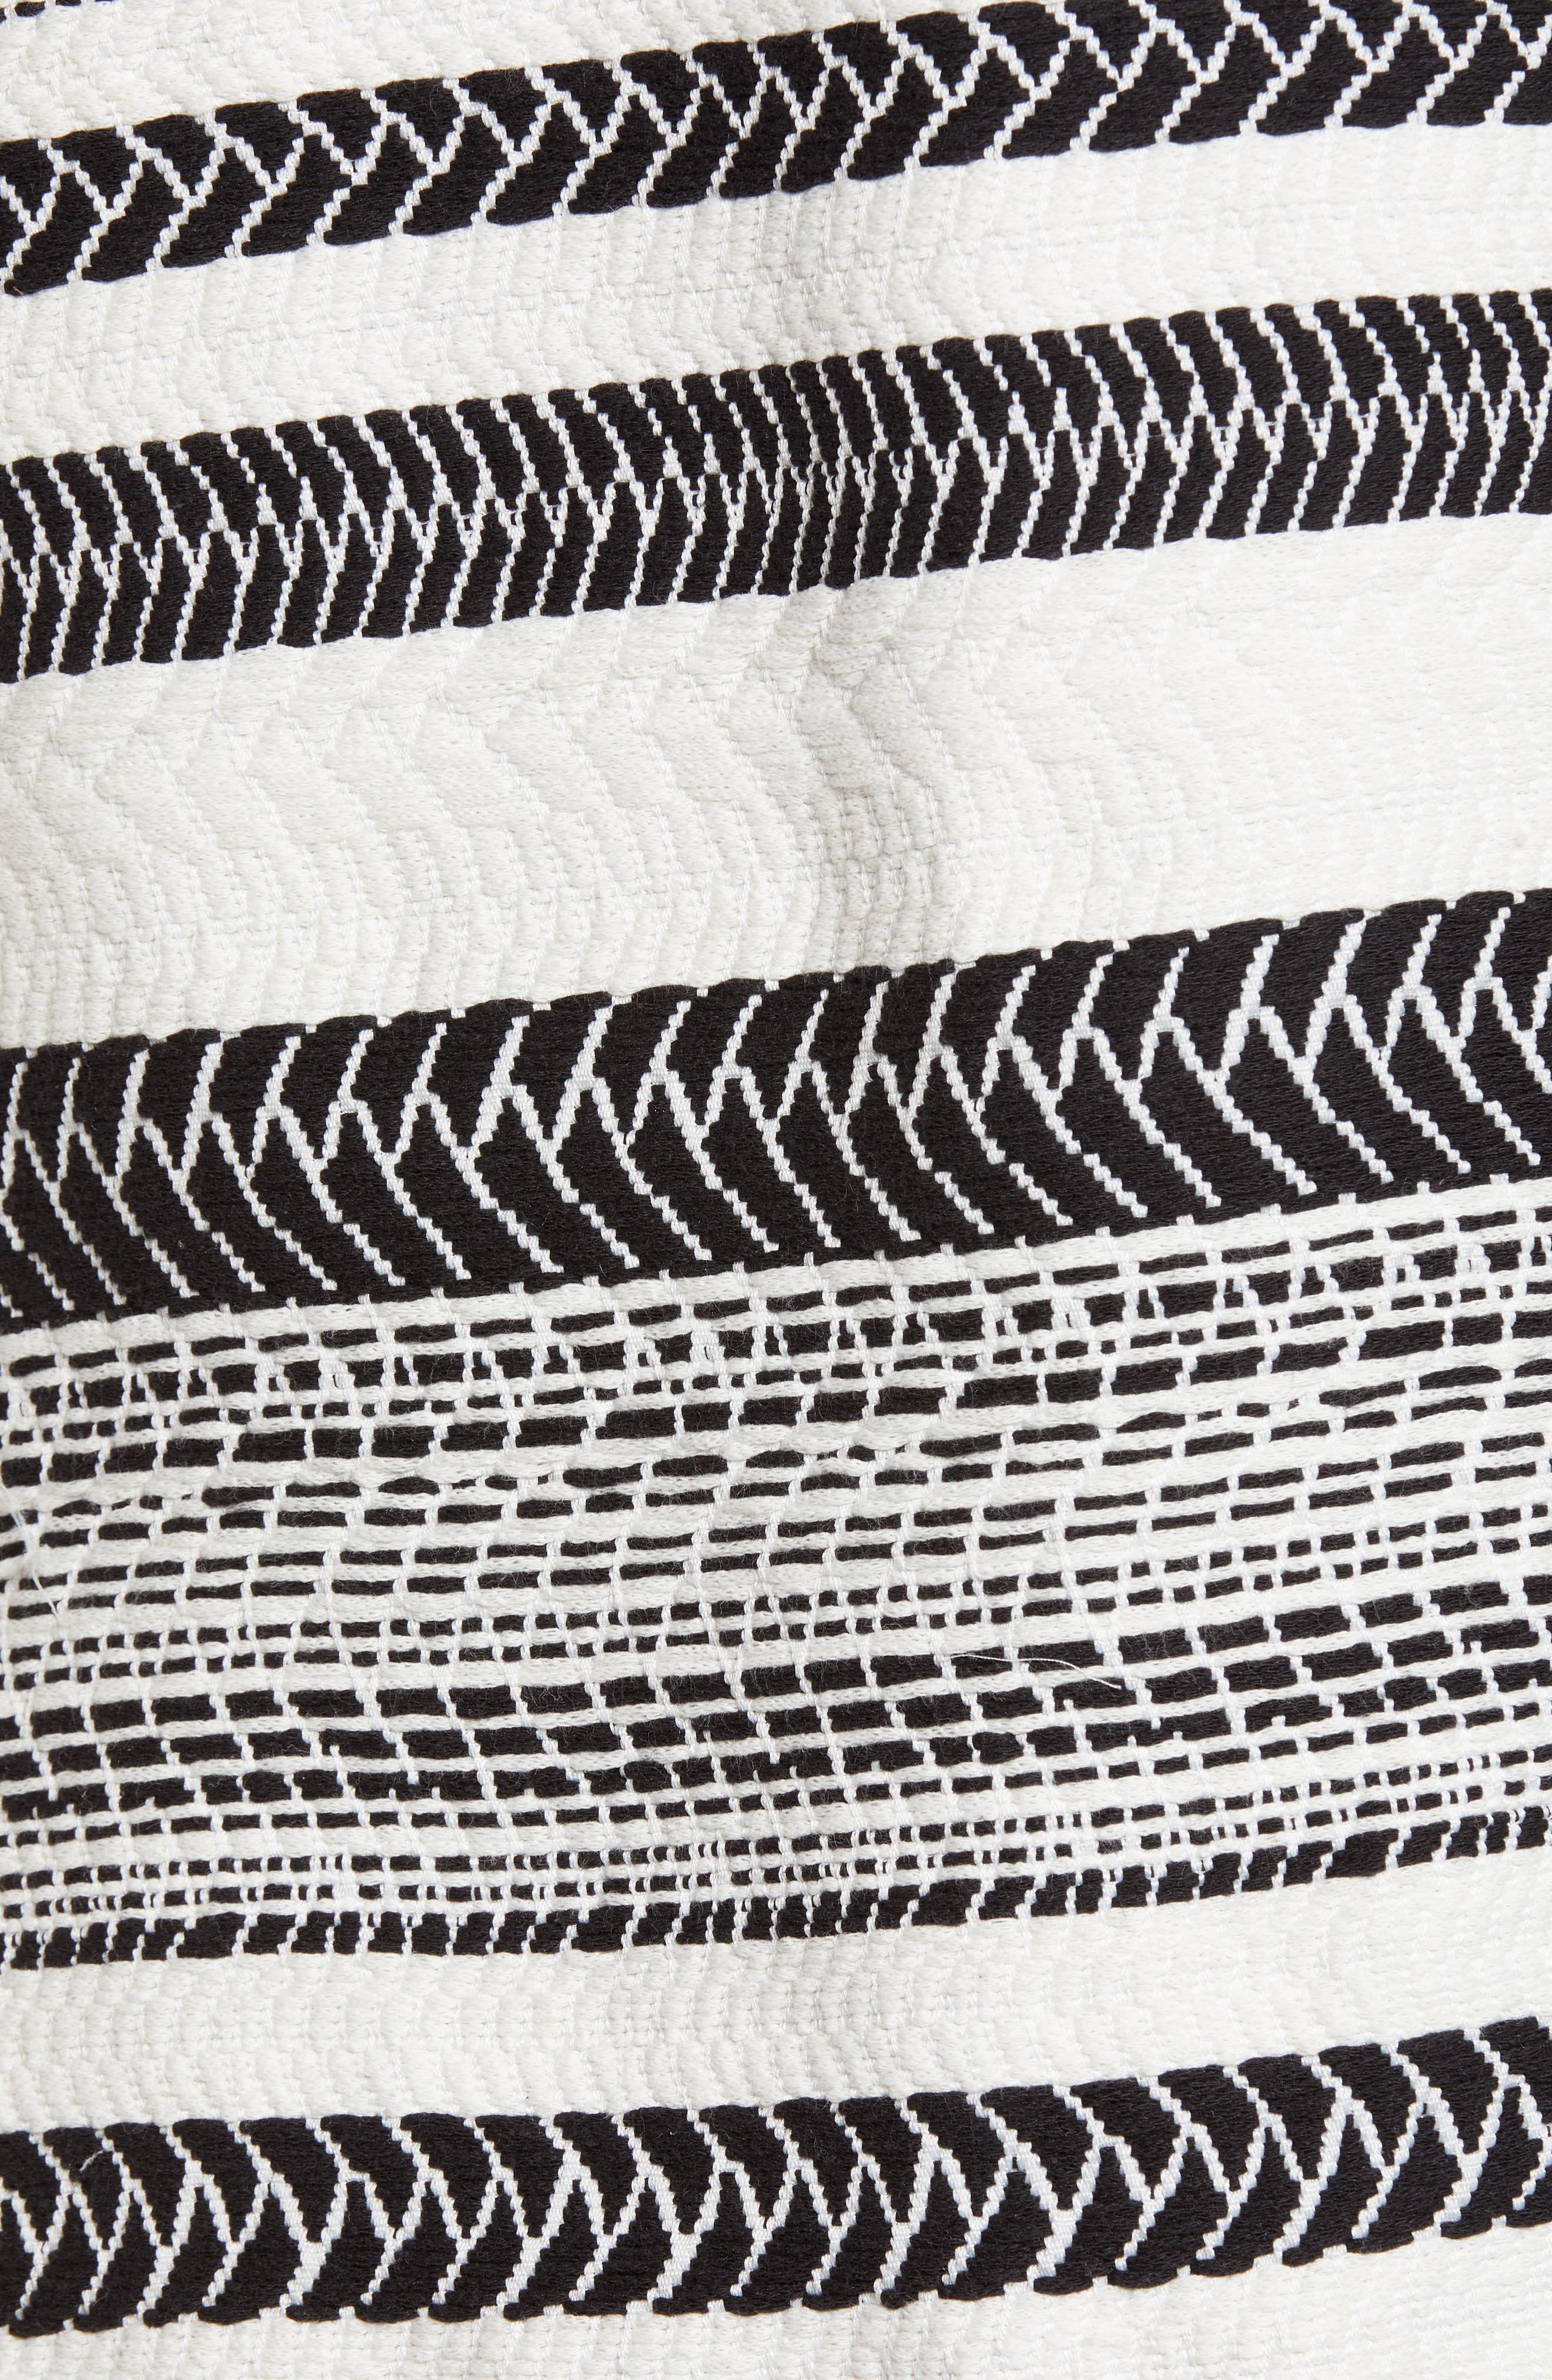 Patterned Cotton Blend Topper,                             Alternate thumbnail 7, color,                             001